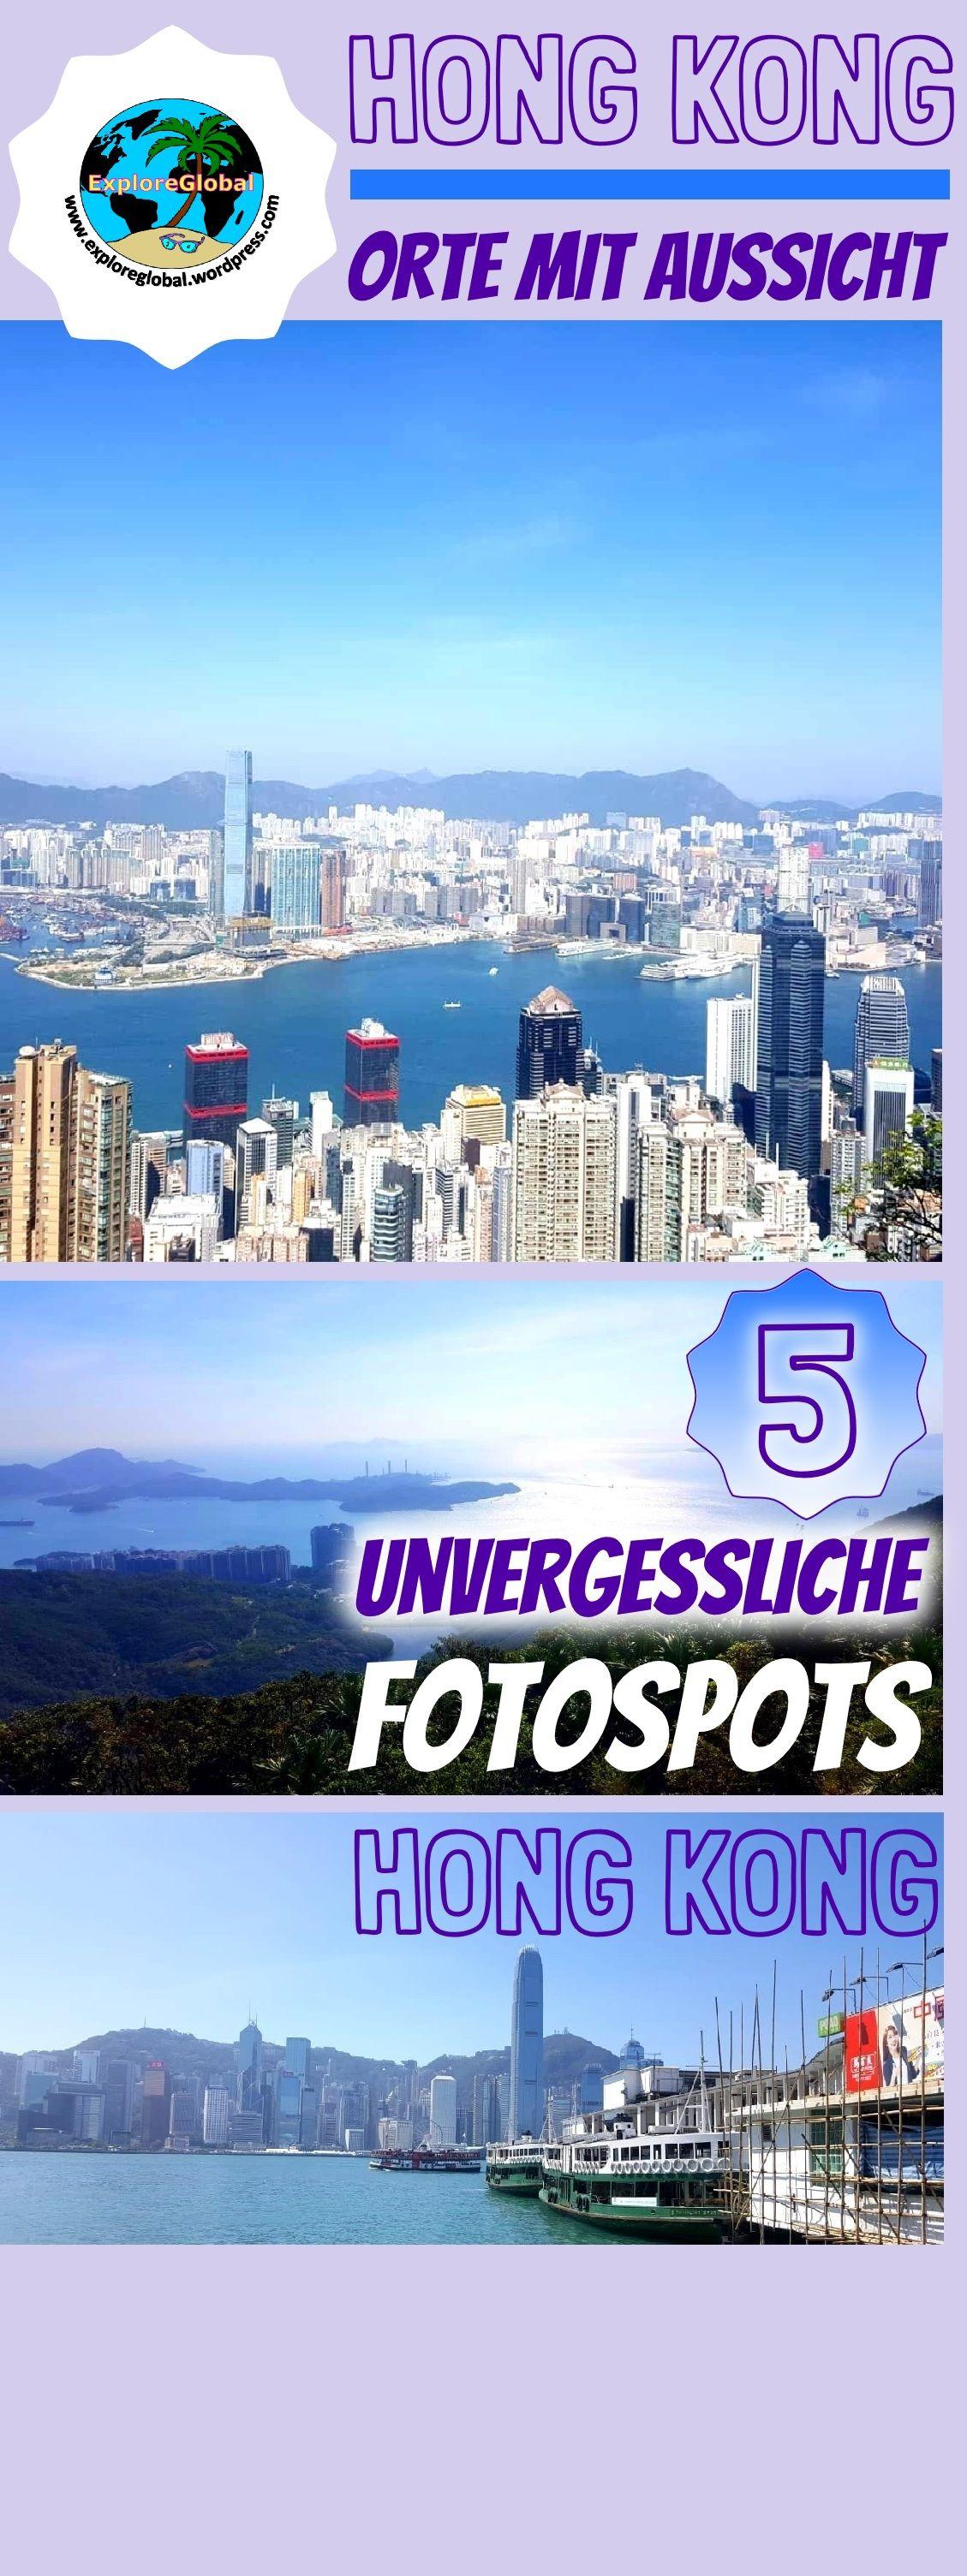 Hong Kong Island & Kowloon Asien Städtereise Städte